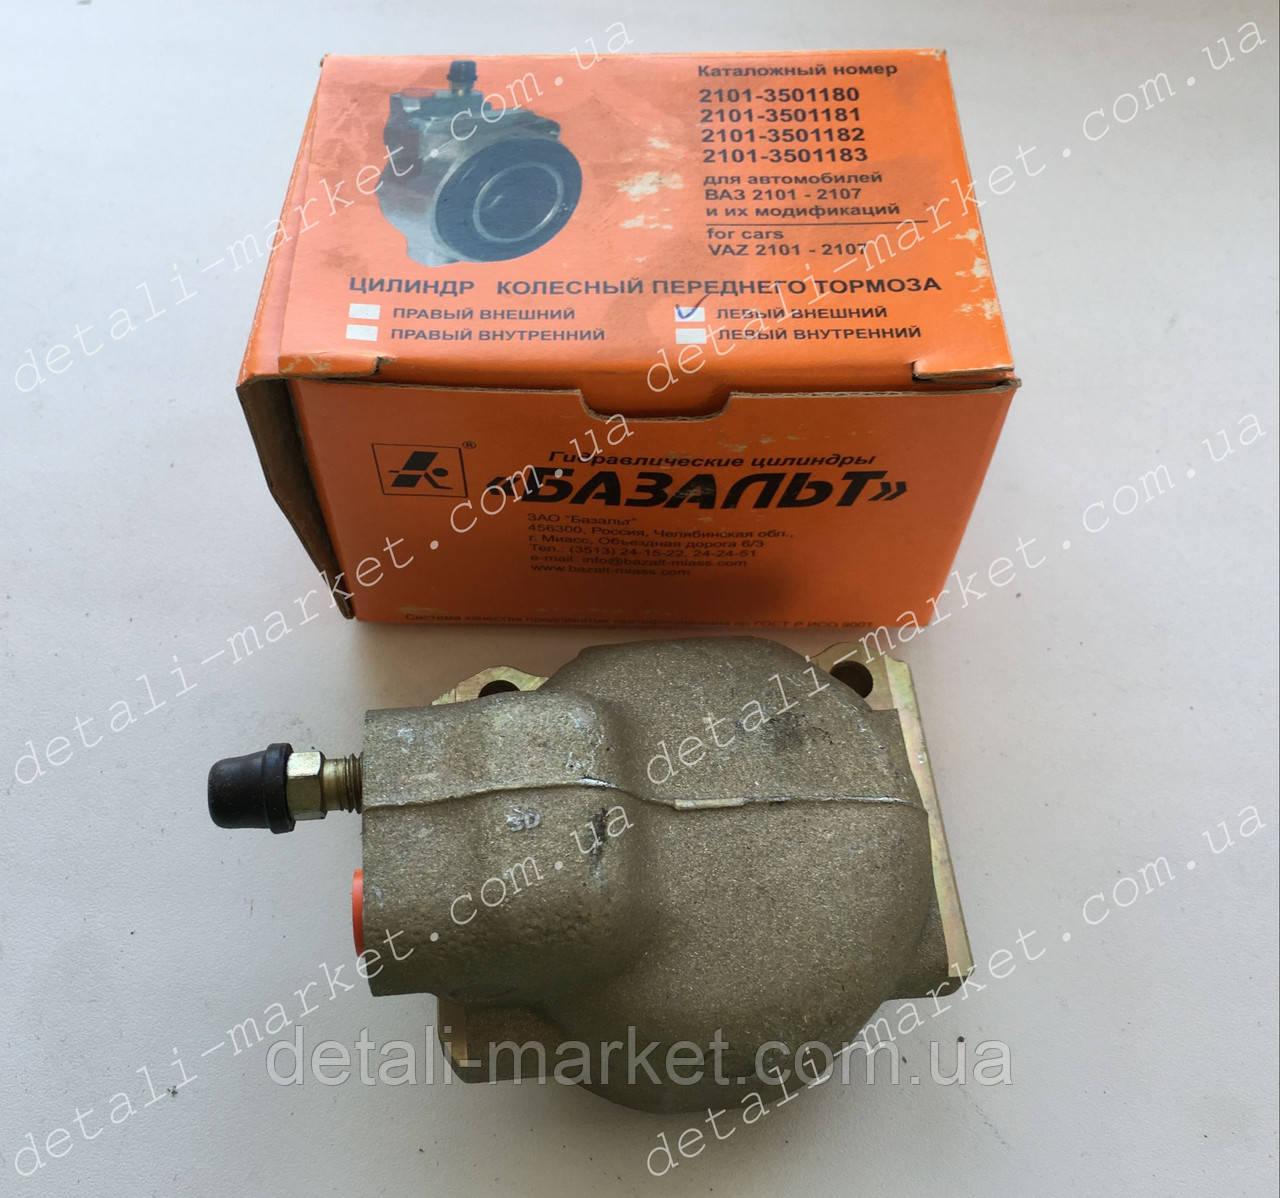 Передний тормозной цилиндр ВАЗ 2101-2107 наружный Базальт